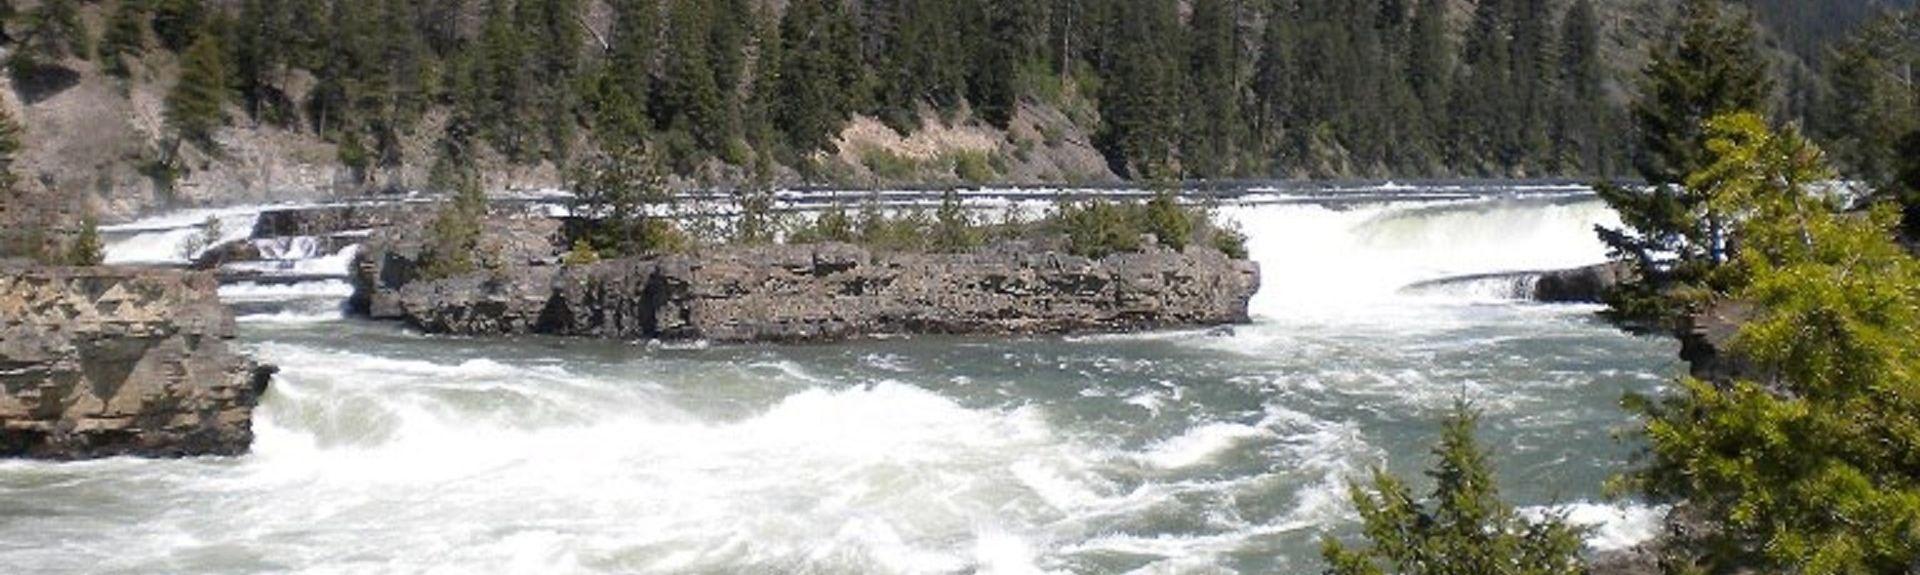 Cataratas de Kootenai, Troy, Montana, Estados Unidos